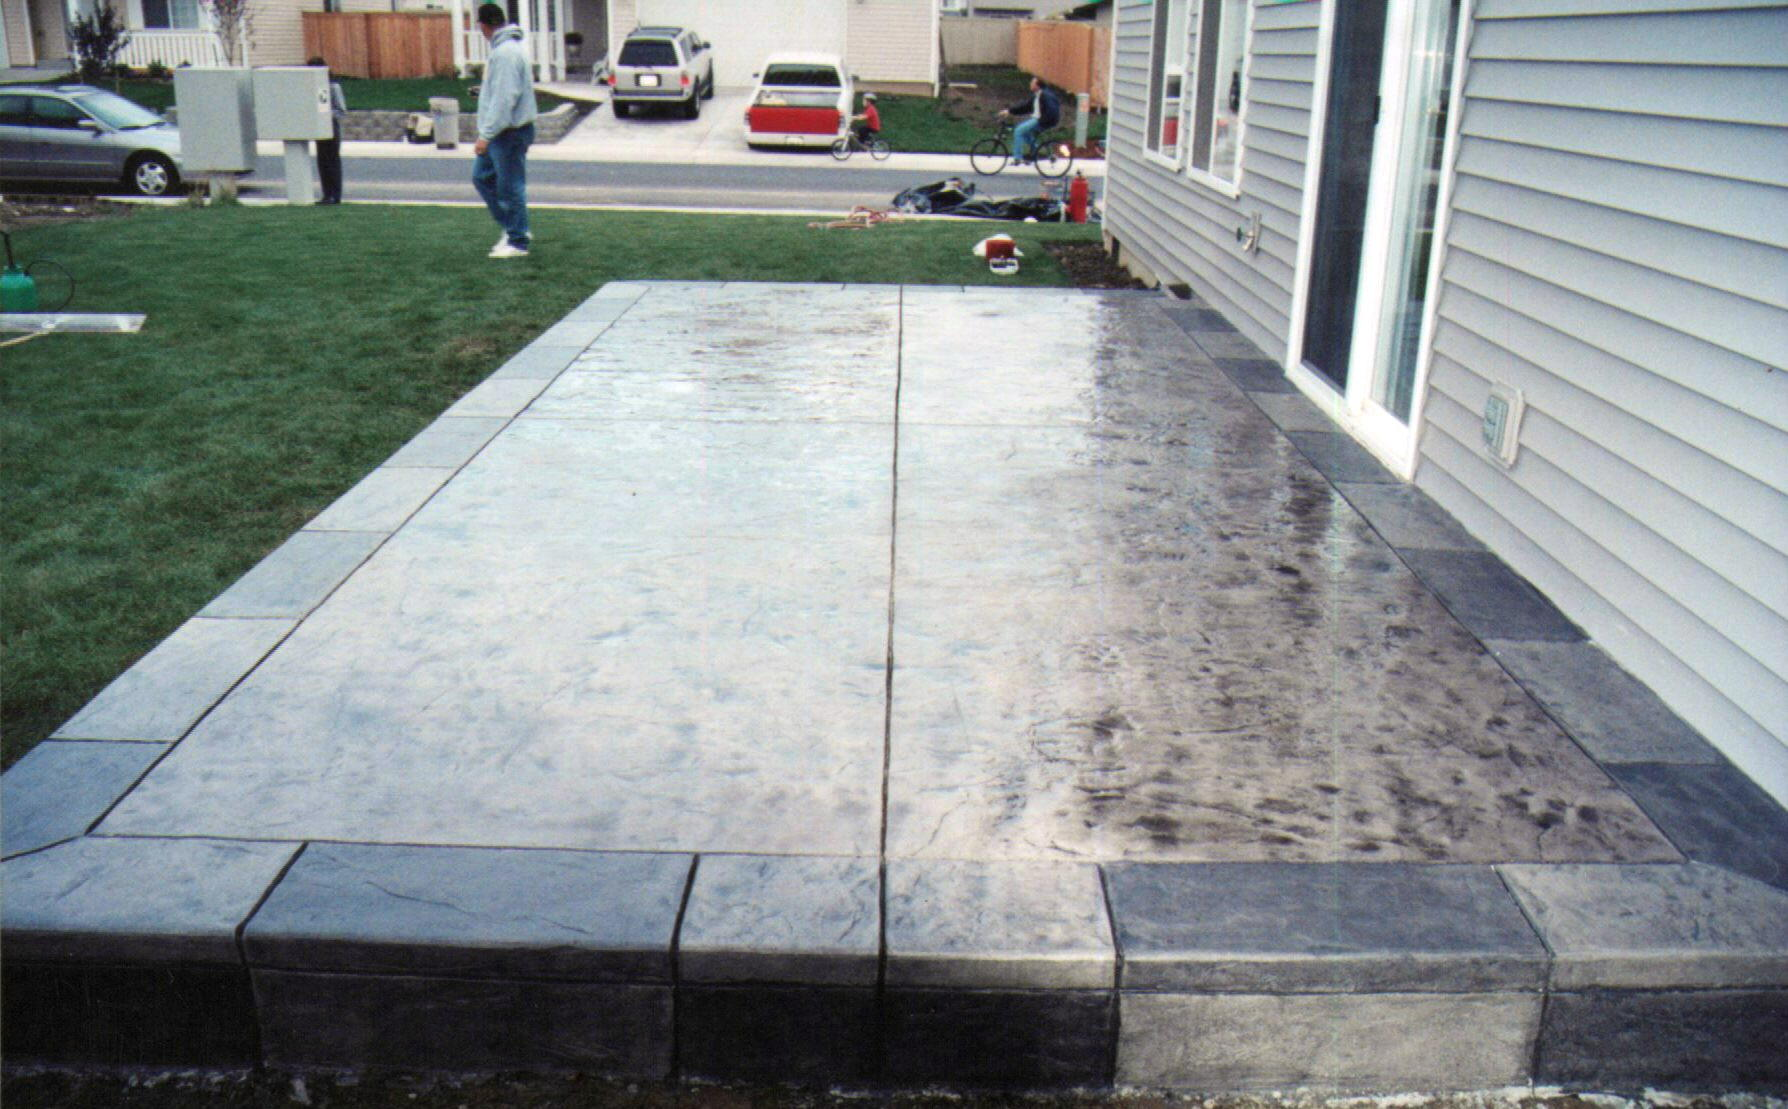 Beautiful Concrete Patio Design Ideas Images - moonrp.us - moonrp.us